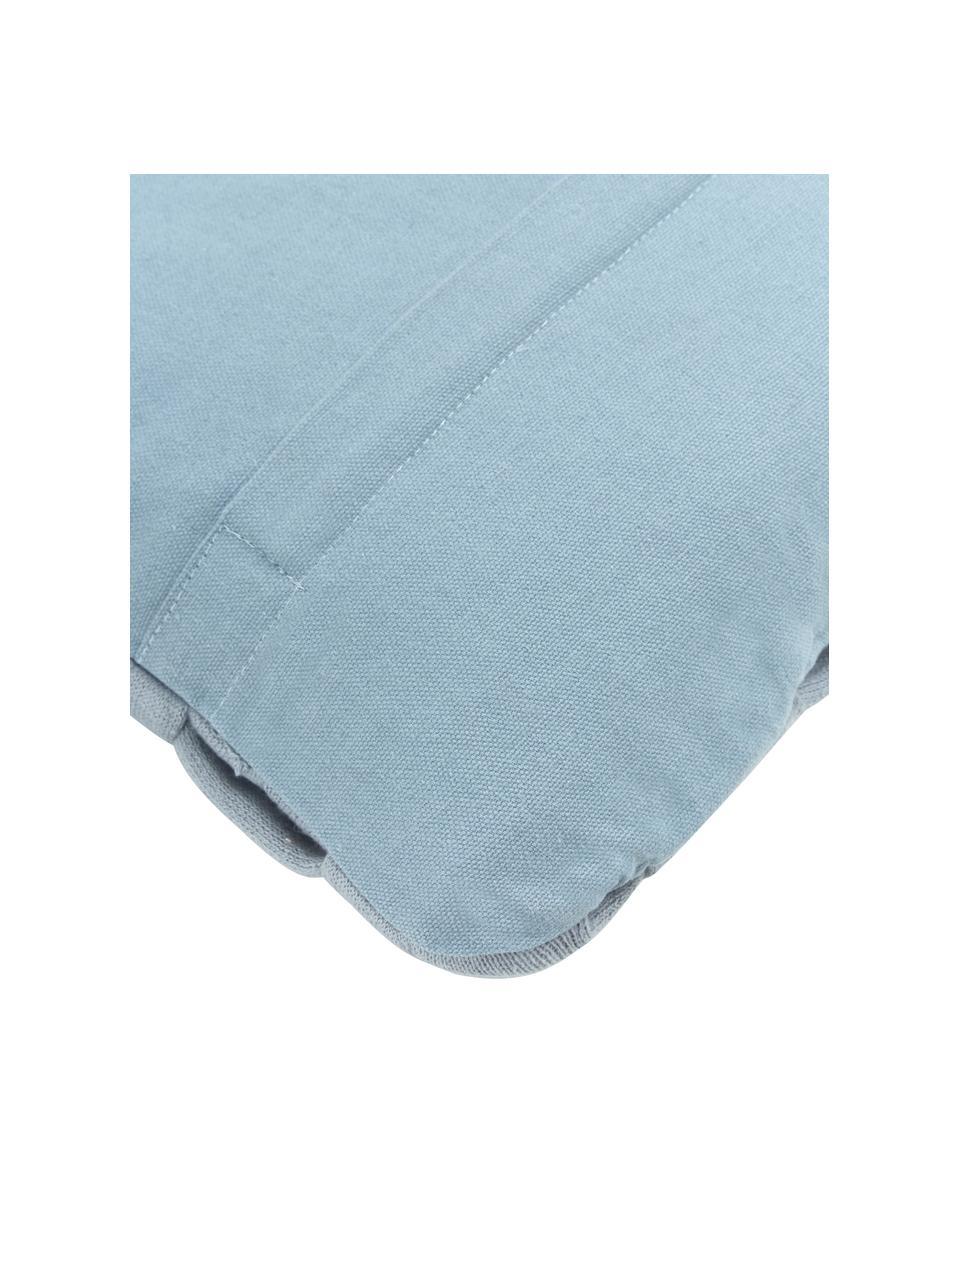 Housse de coussin rectangulaire bleu Norman, Bleu